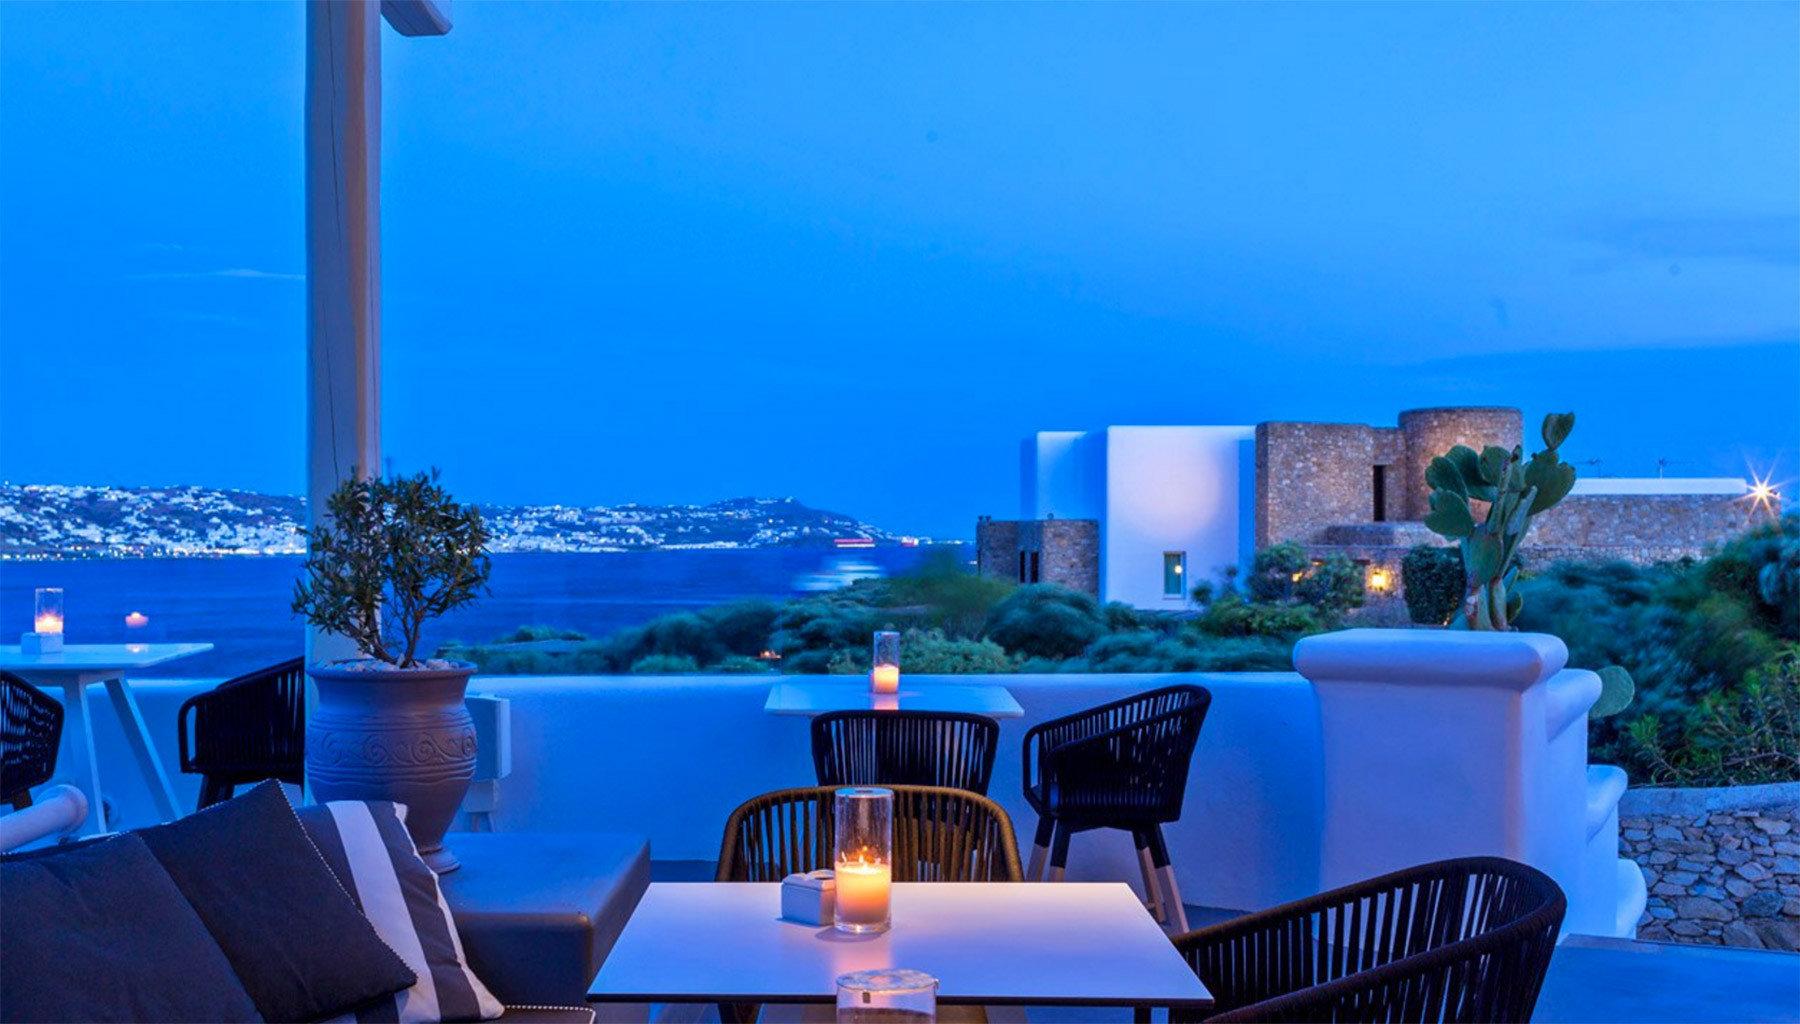 sky chair blue Resort swimming pool Sea restaurant Deck set